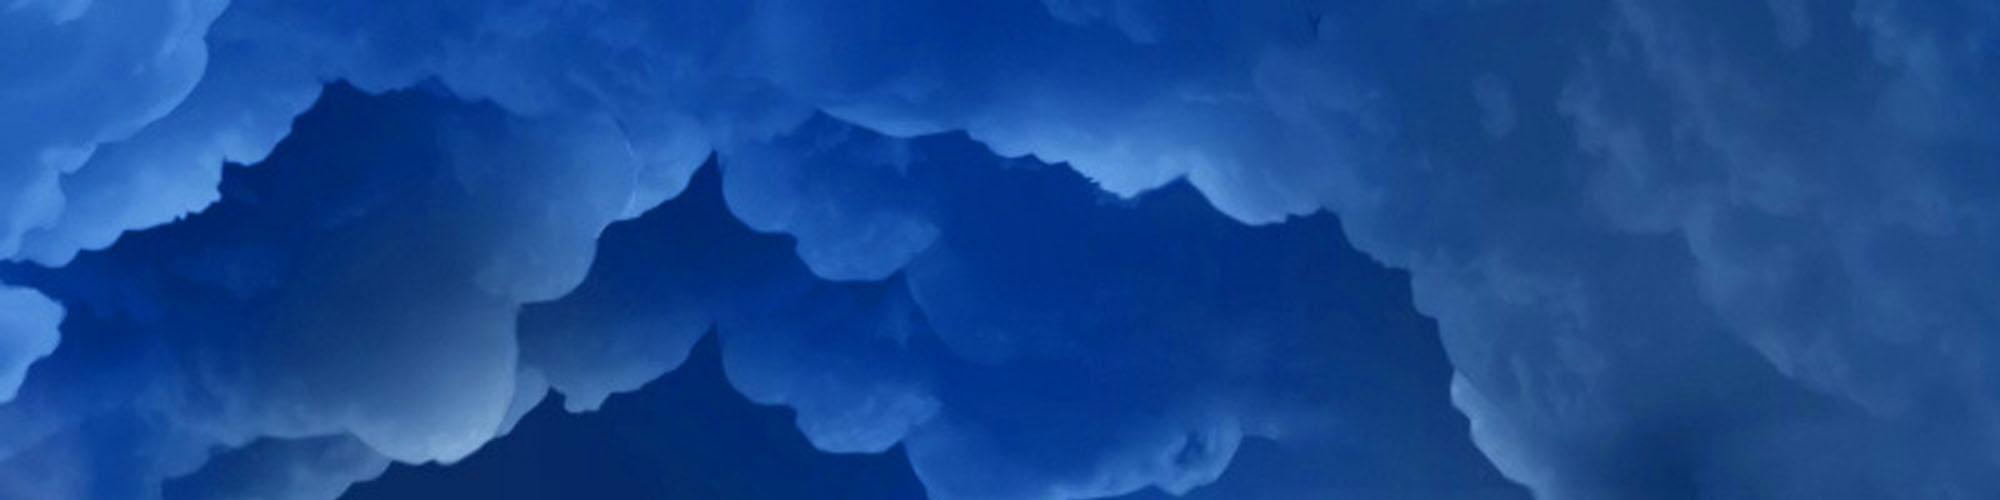 mooncircles-background